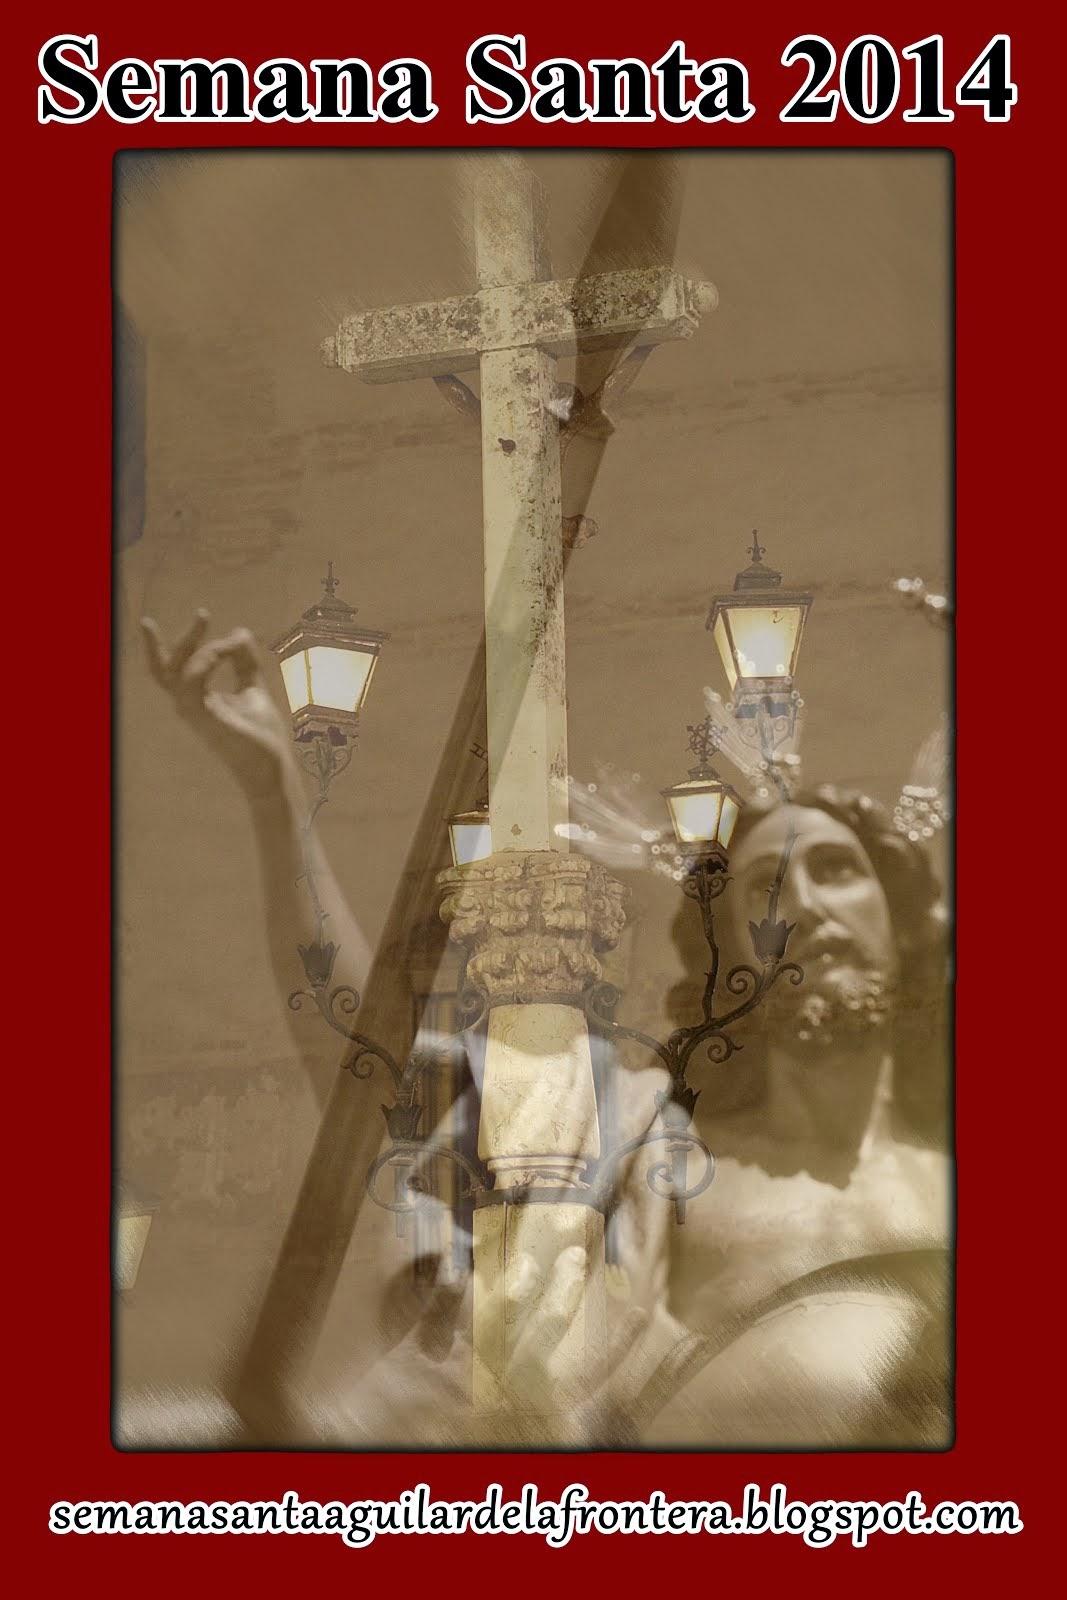 II Cartel Blog Semana Santa Aguilar de la Frontera